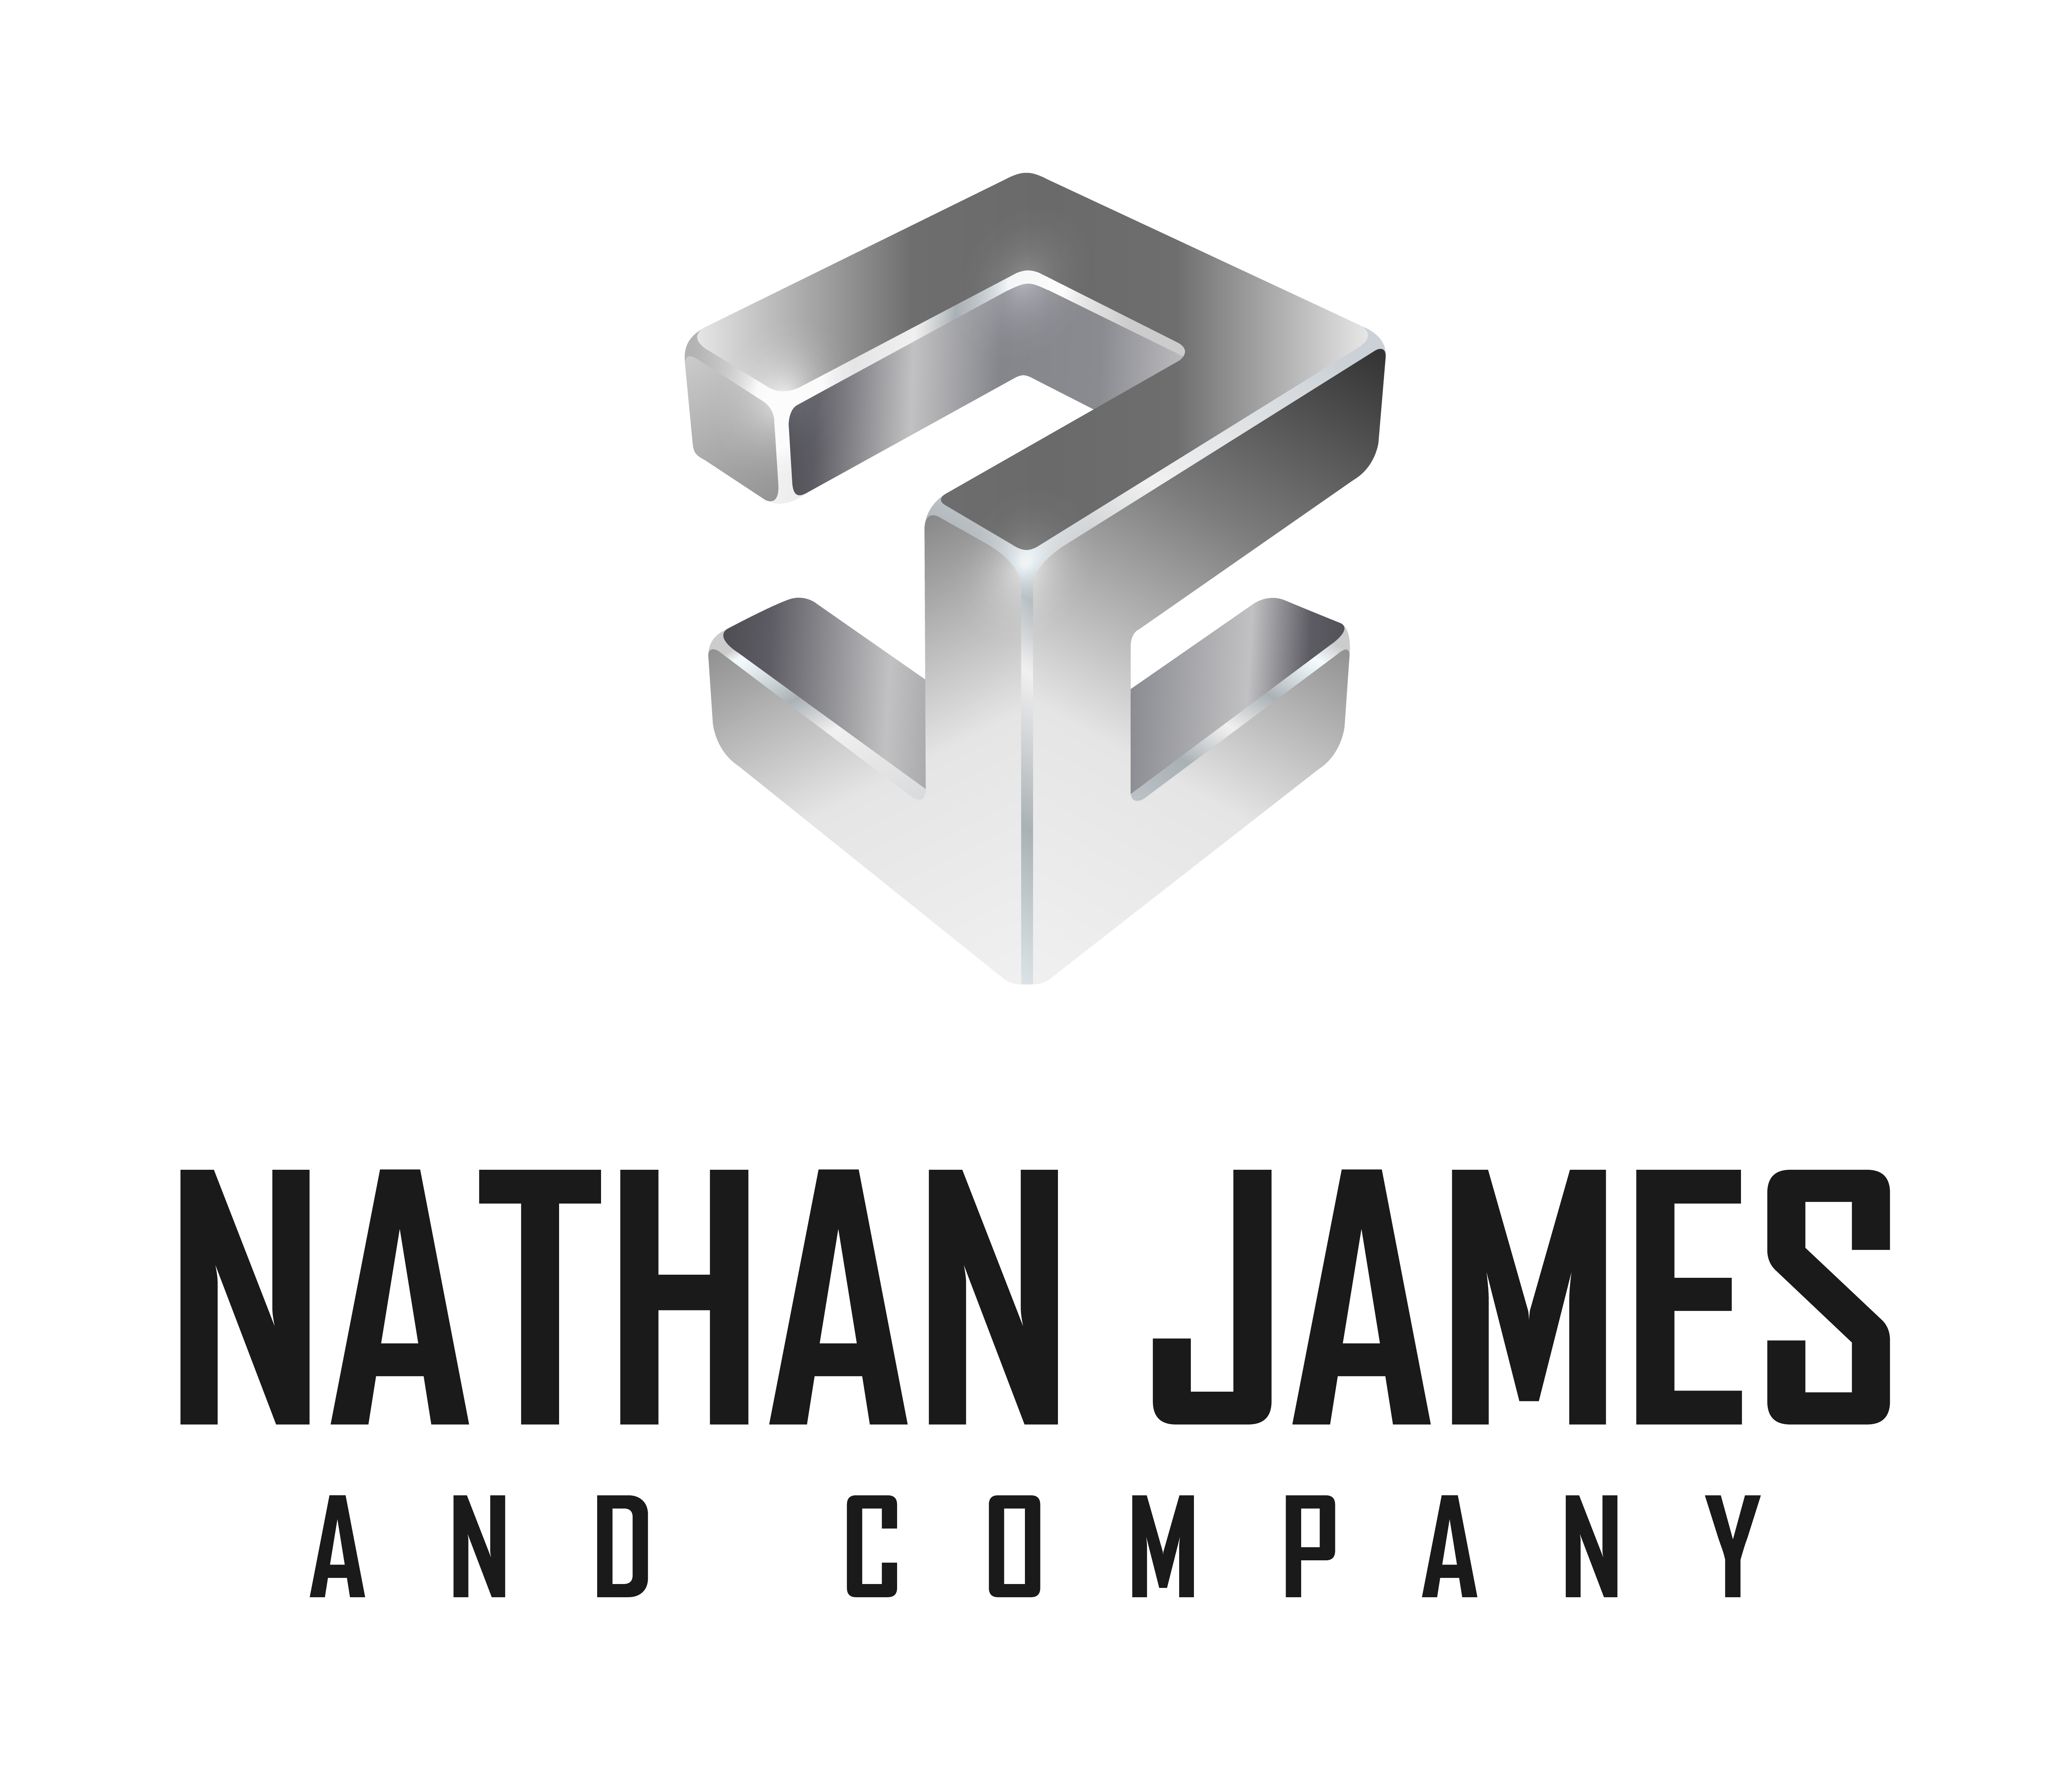 Nathan James and Associates Logo full color